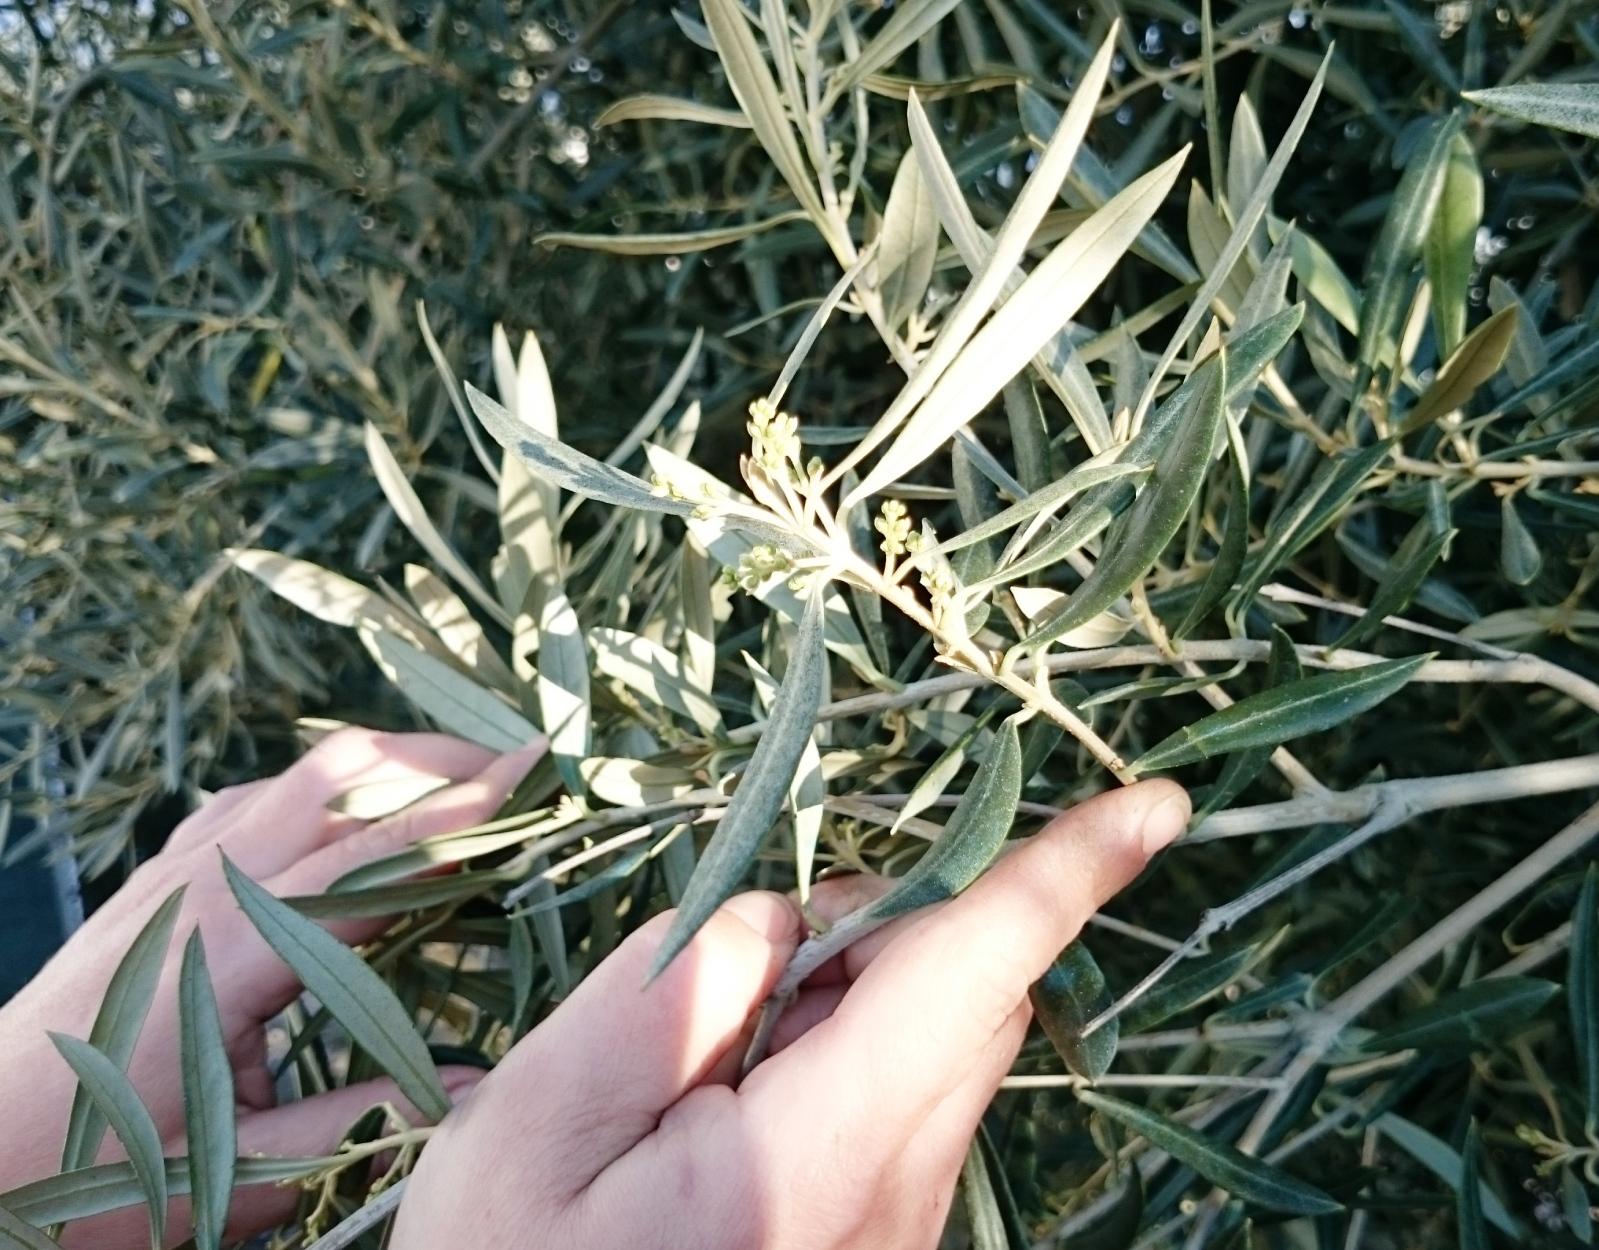 cosecha 2016-17 2rh2rlx